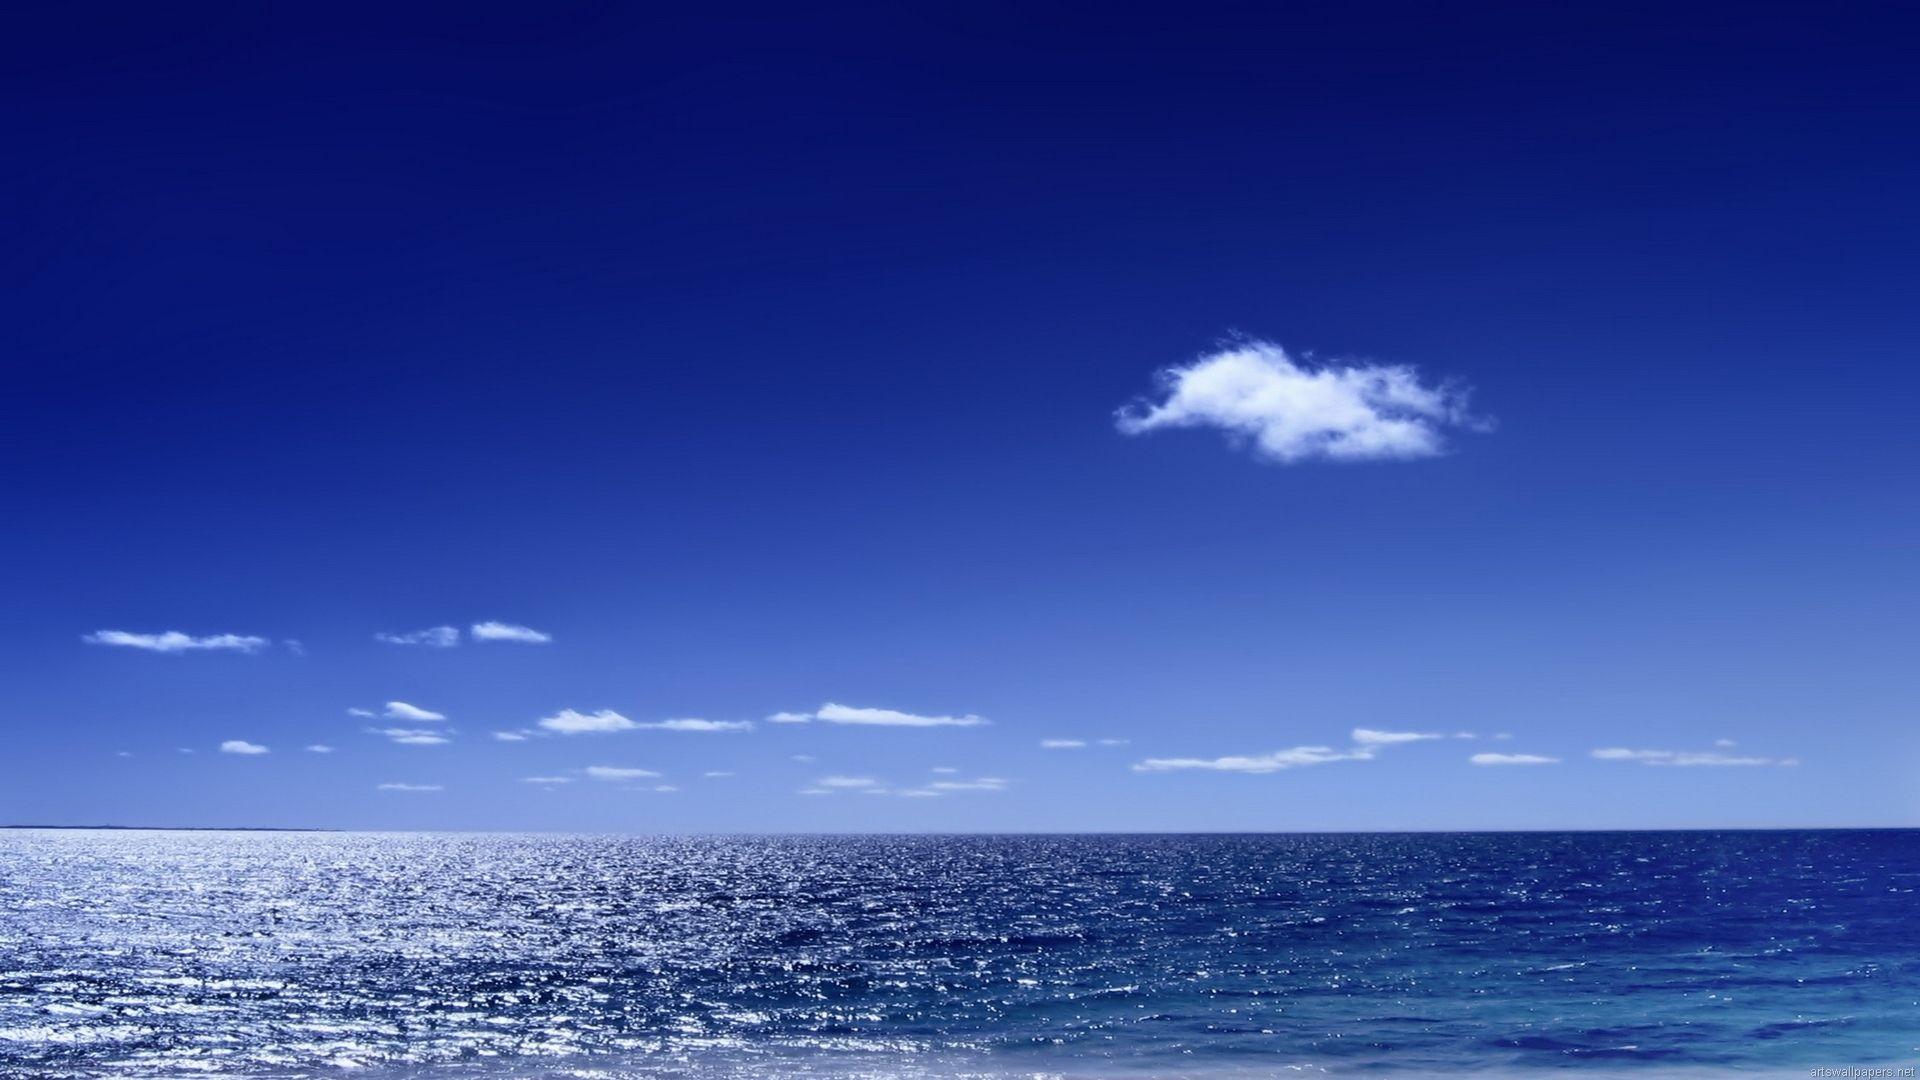 desktop seaview hd wallpapers wallpapers sea view ocean rh pinterest com